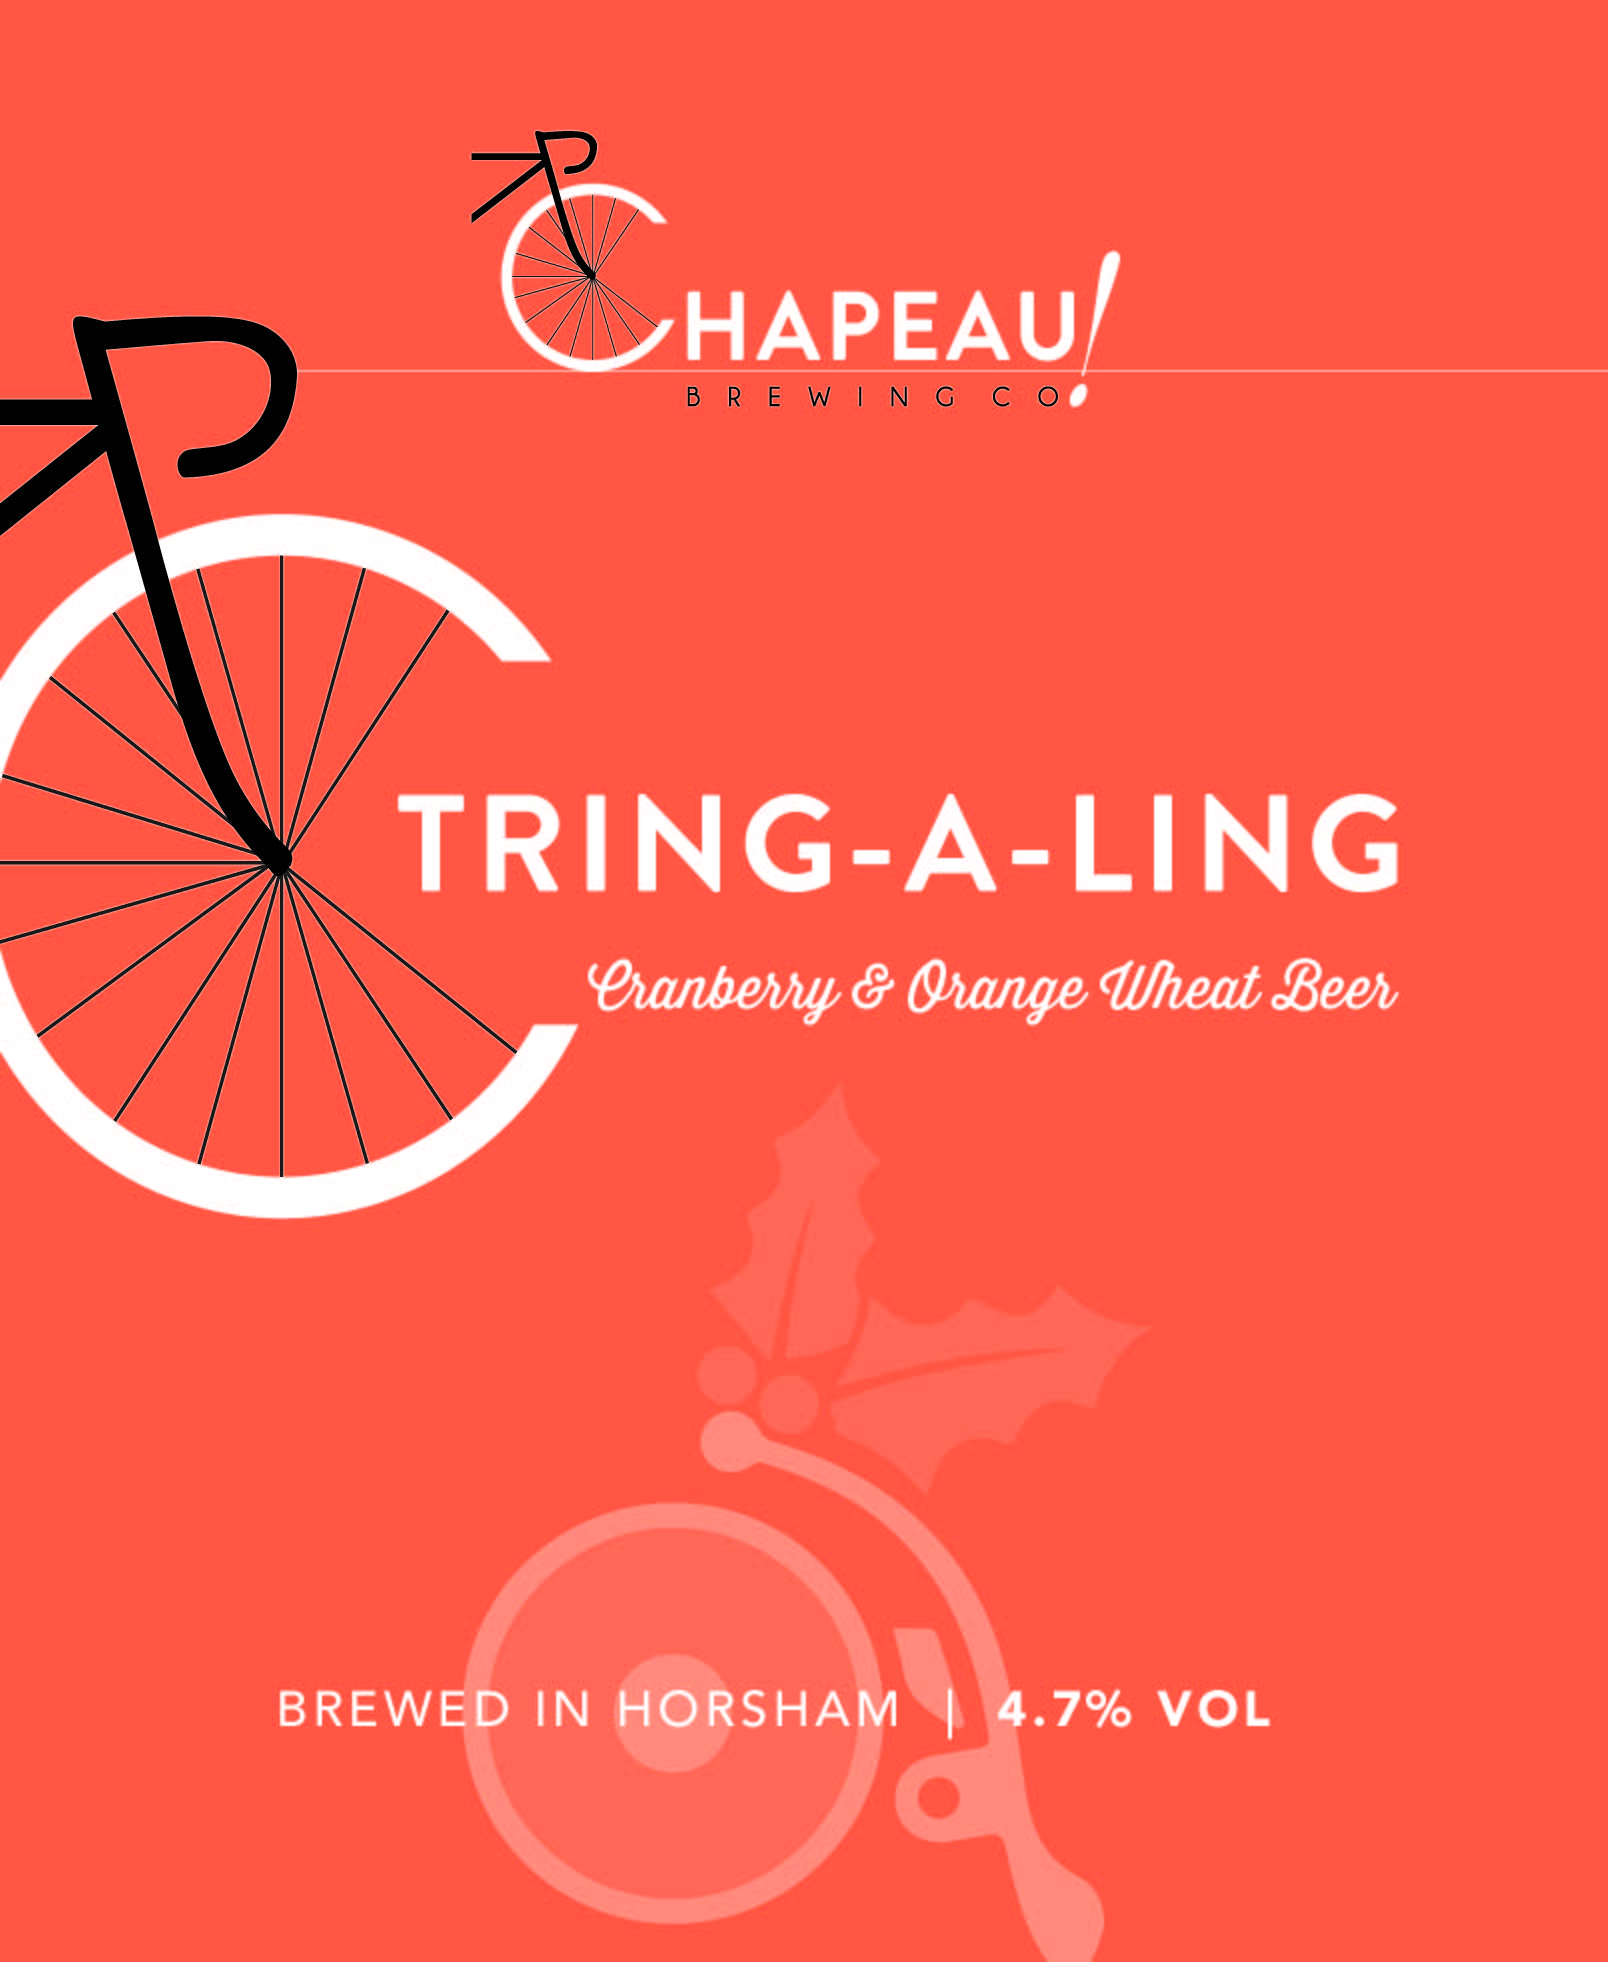 Chapeau_PumpClip_Tringaling-01 (1).jpg